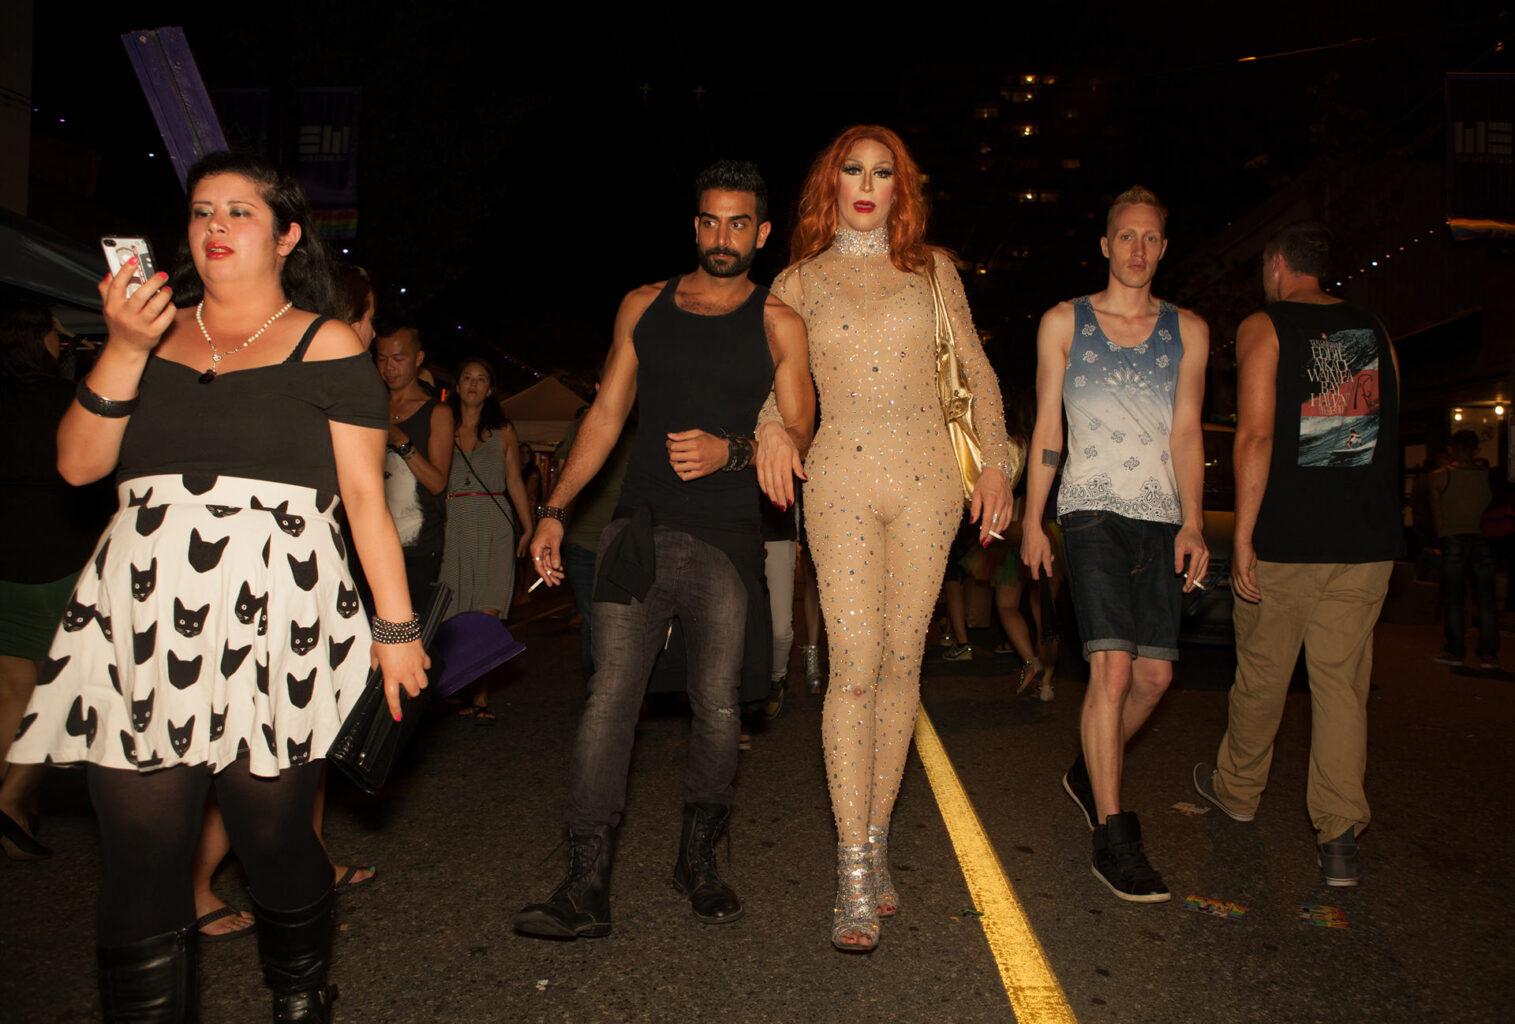 Gold bodysuit, Vancouver Pride, Canada, 2014